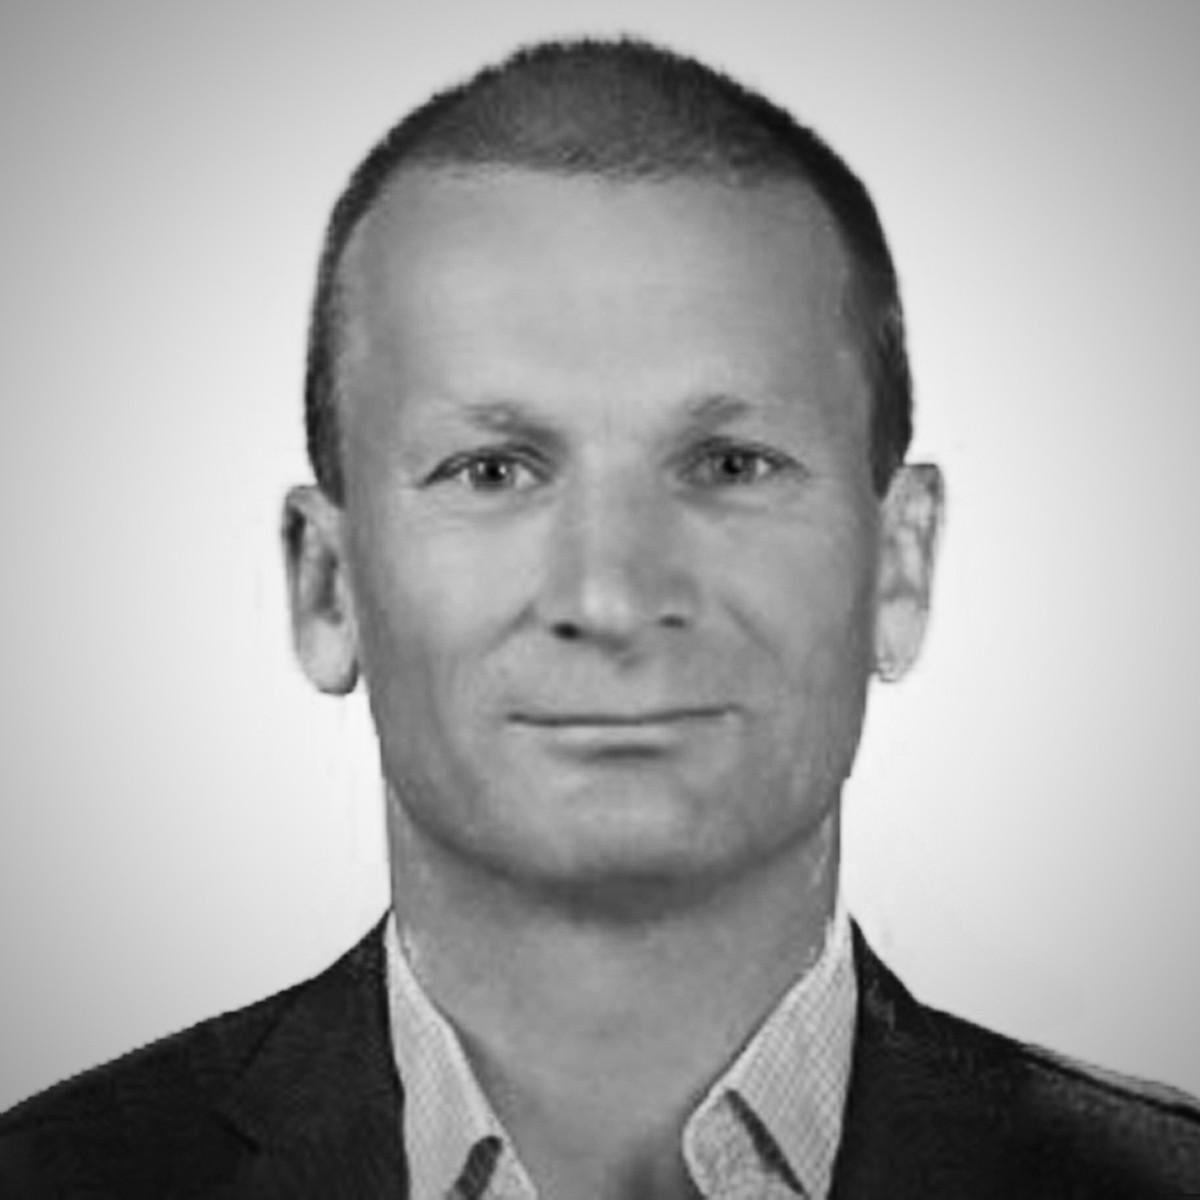 David Hansen